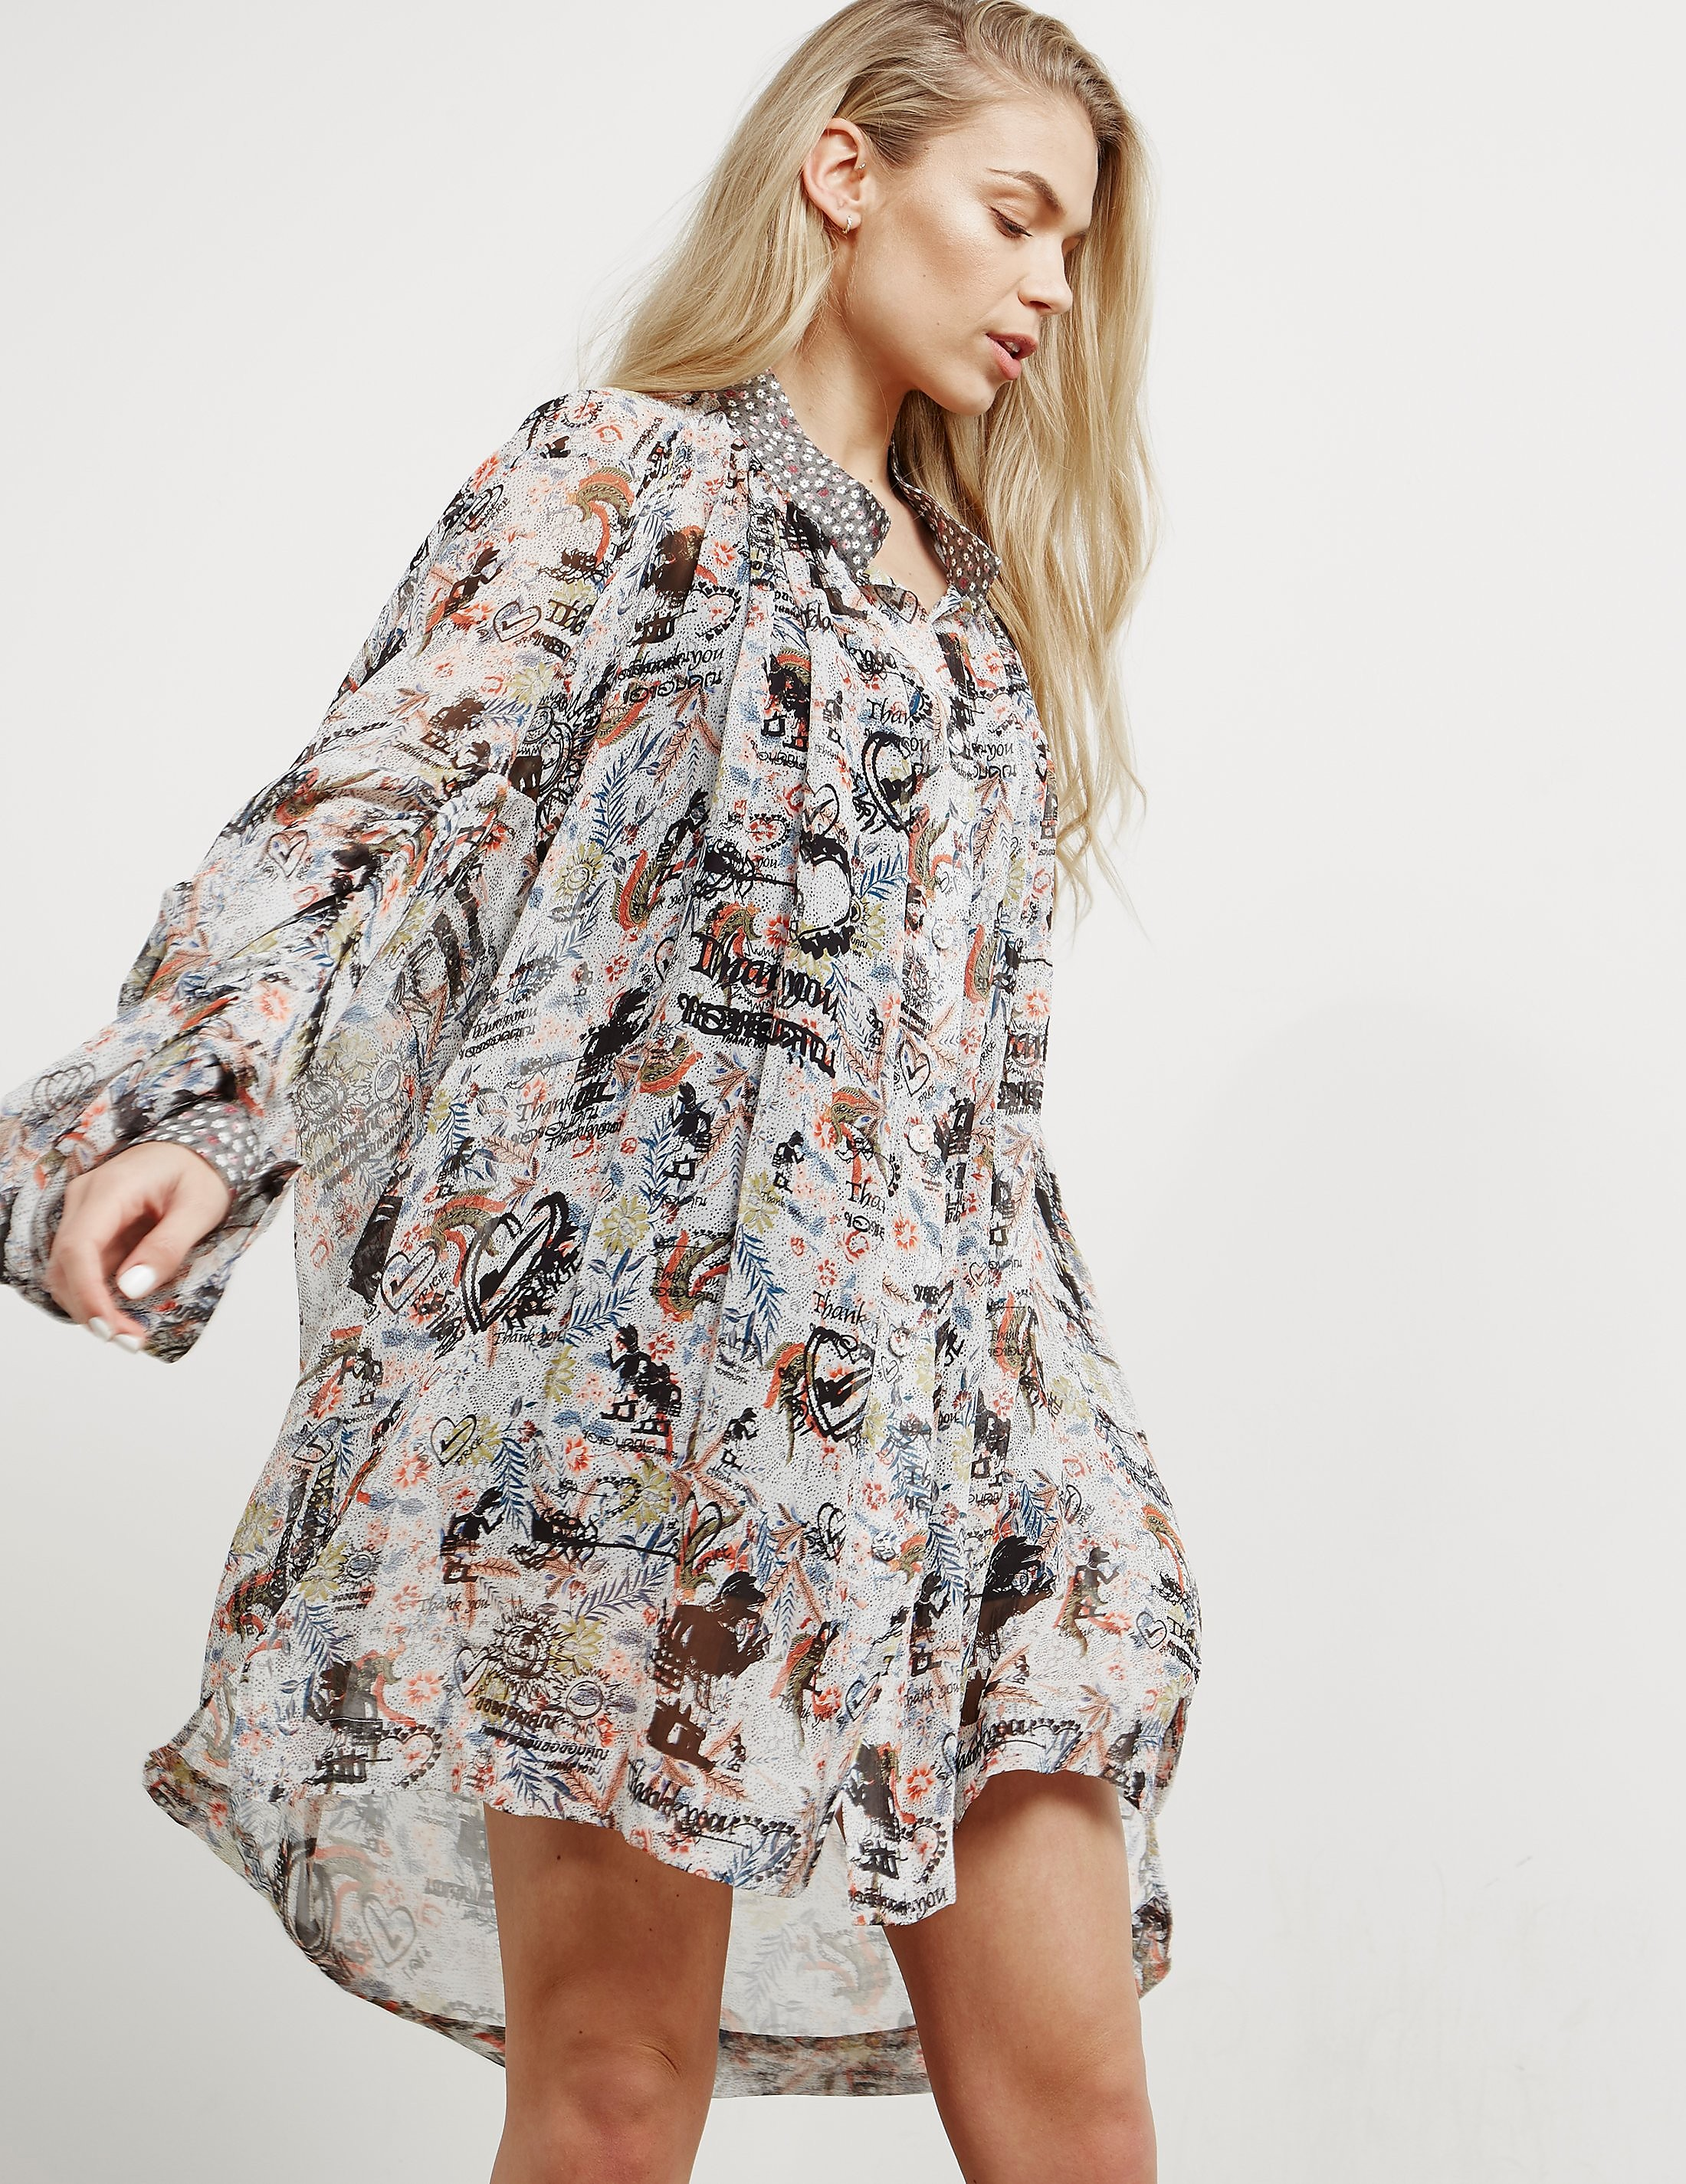 Vivienne Westwood Anglomania Gabelle Shirt Dress